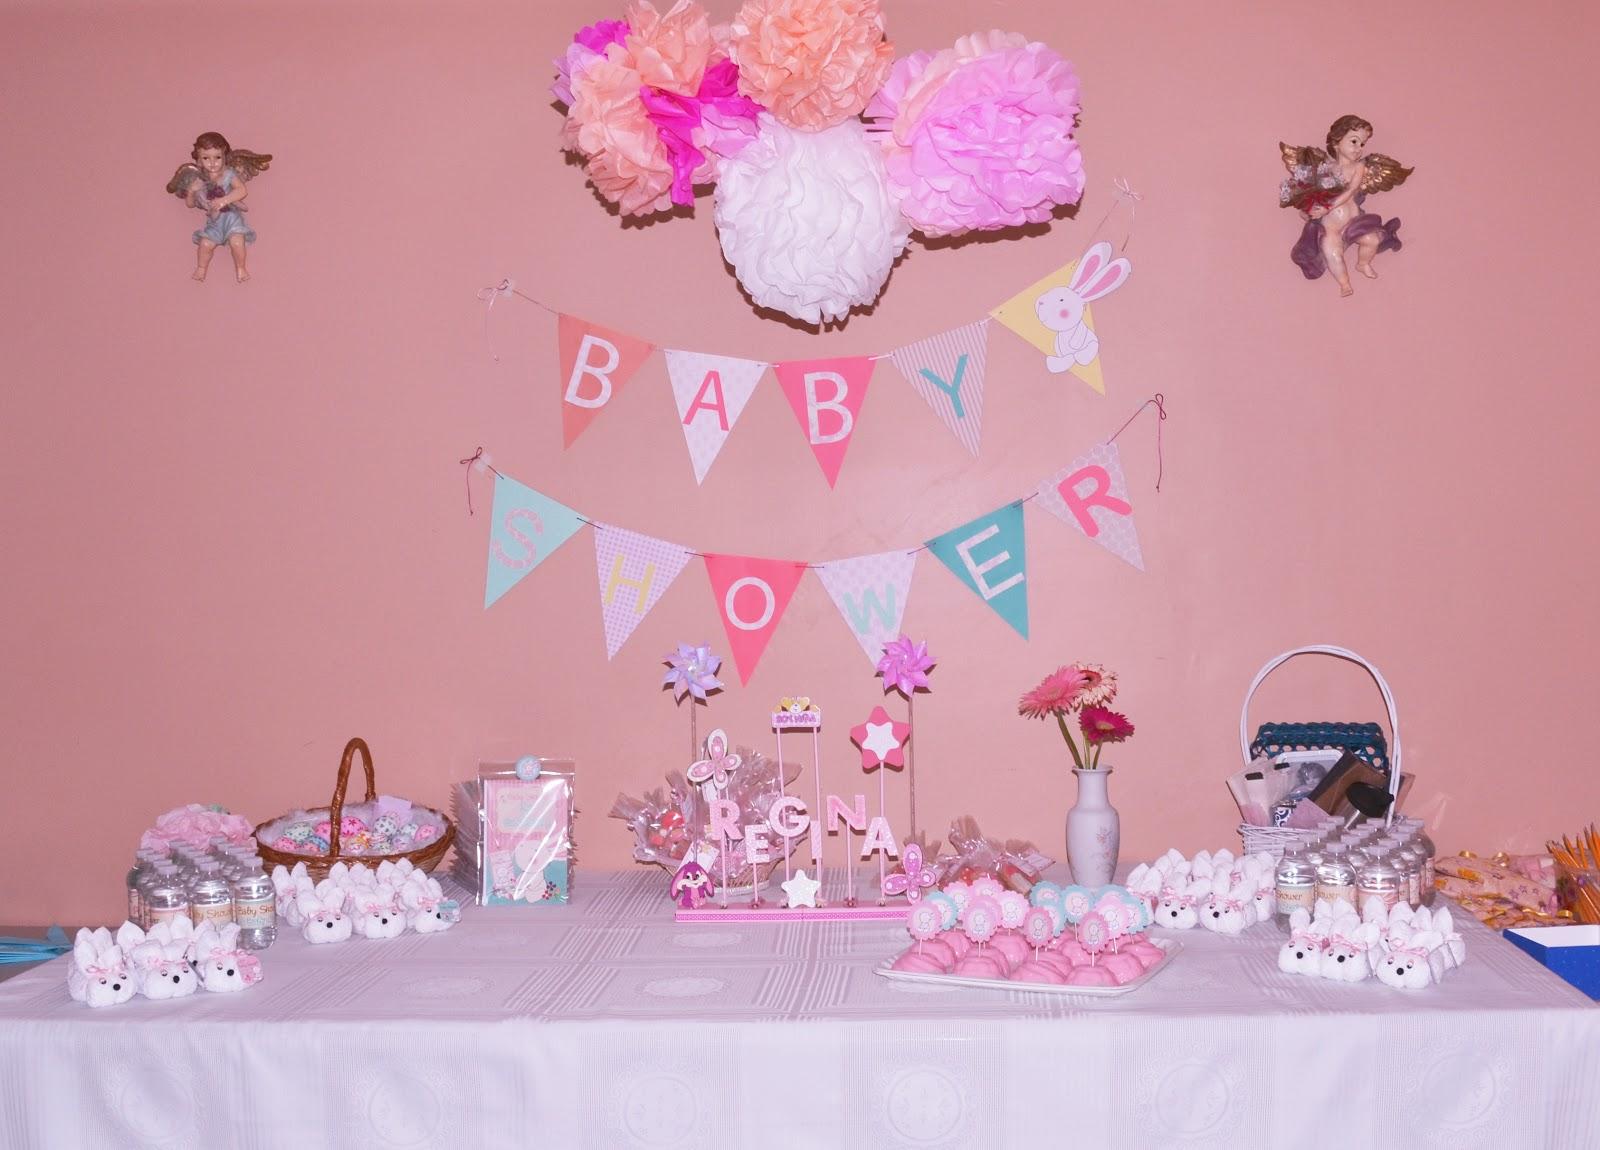 Detalles para babyshower imagui - Detalles para baby shower ...